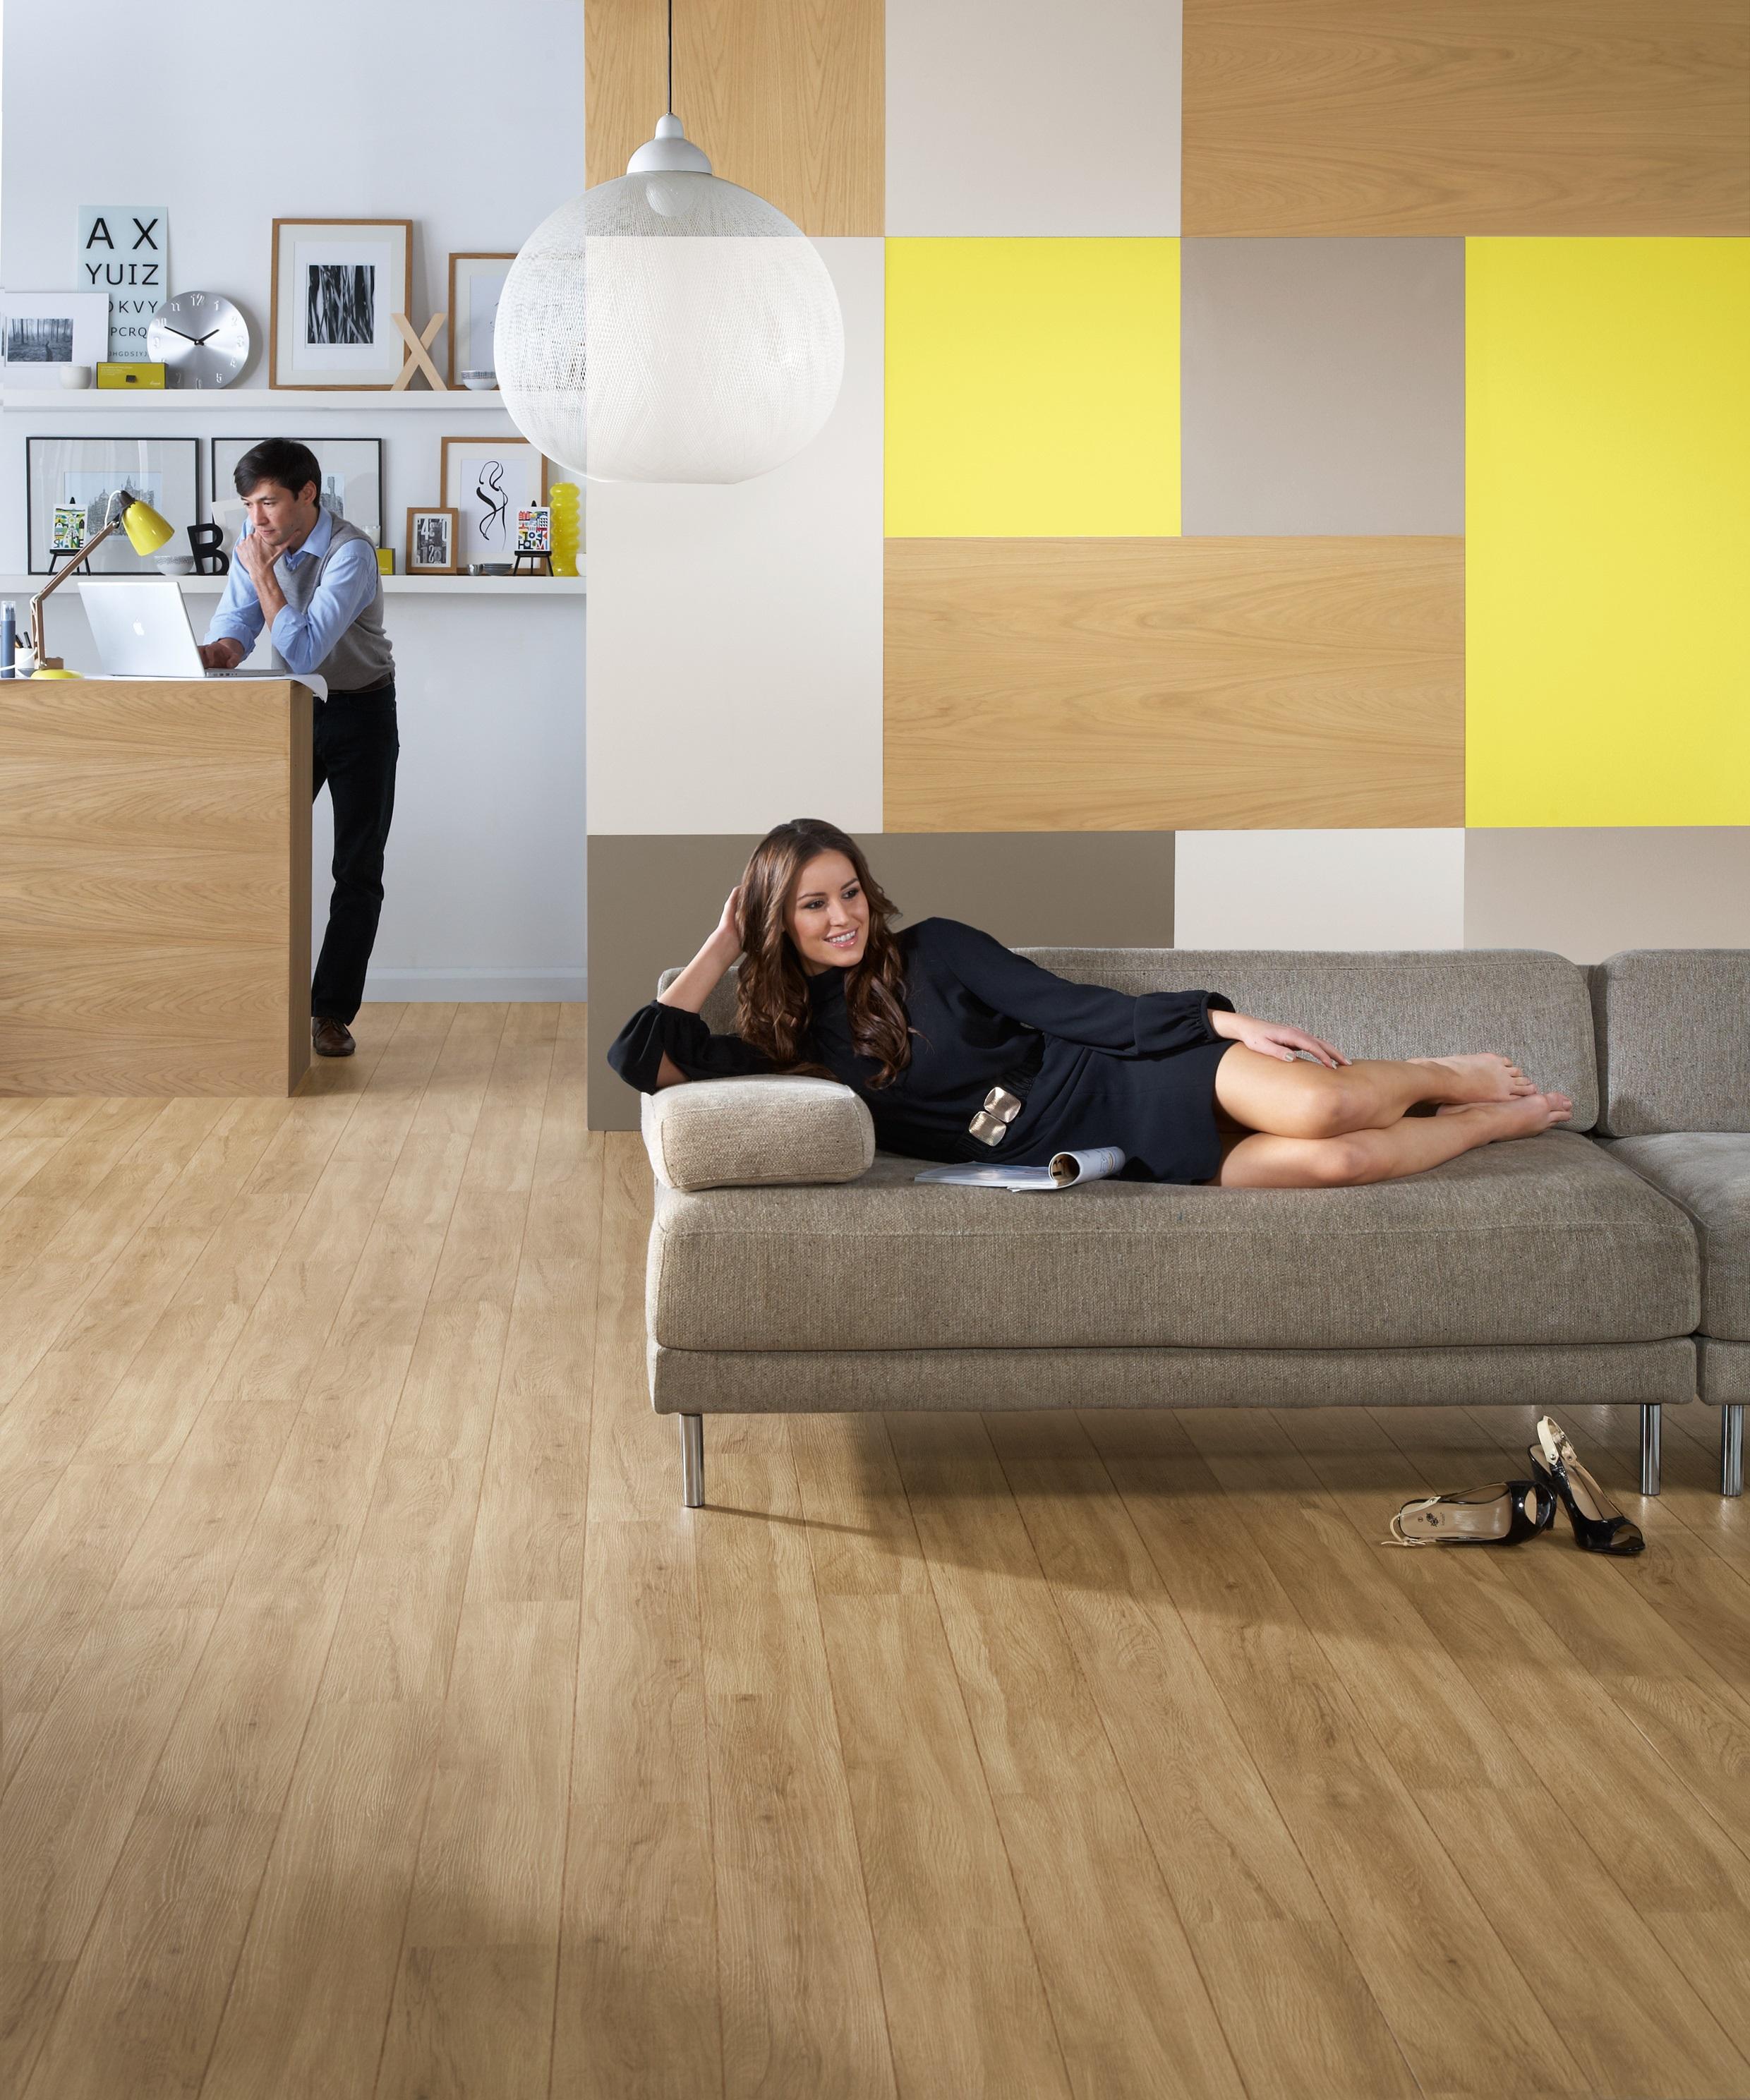 Colonia_English_oak_LVT_luxury_vinyl_tiles_carpet_fit_offer_south_wales_valleys_aberdare_aberaman_industrial_estate_flooring_1